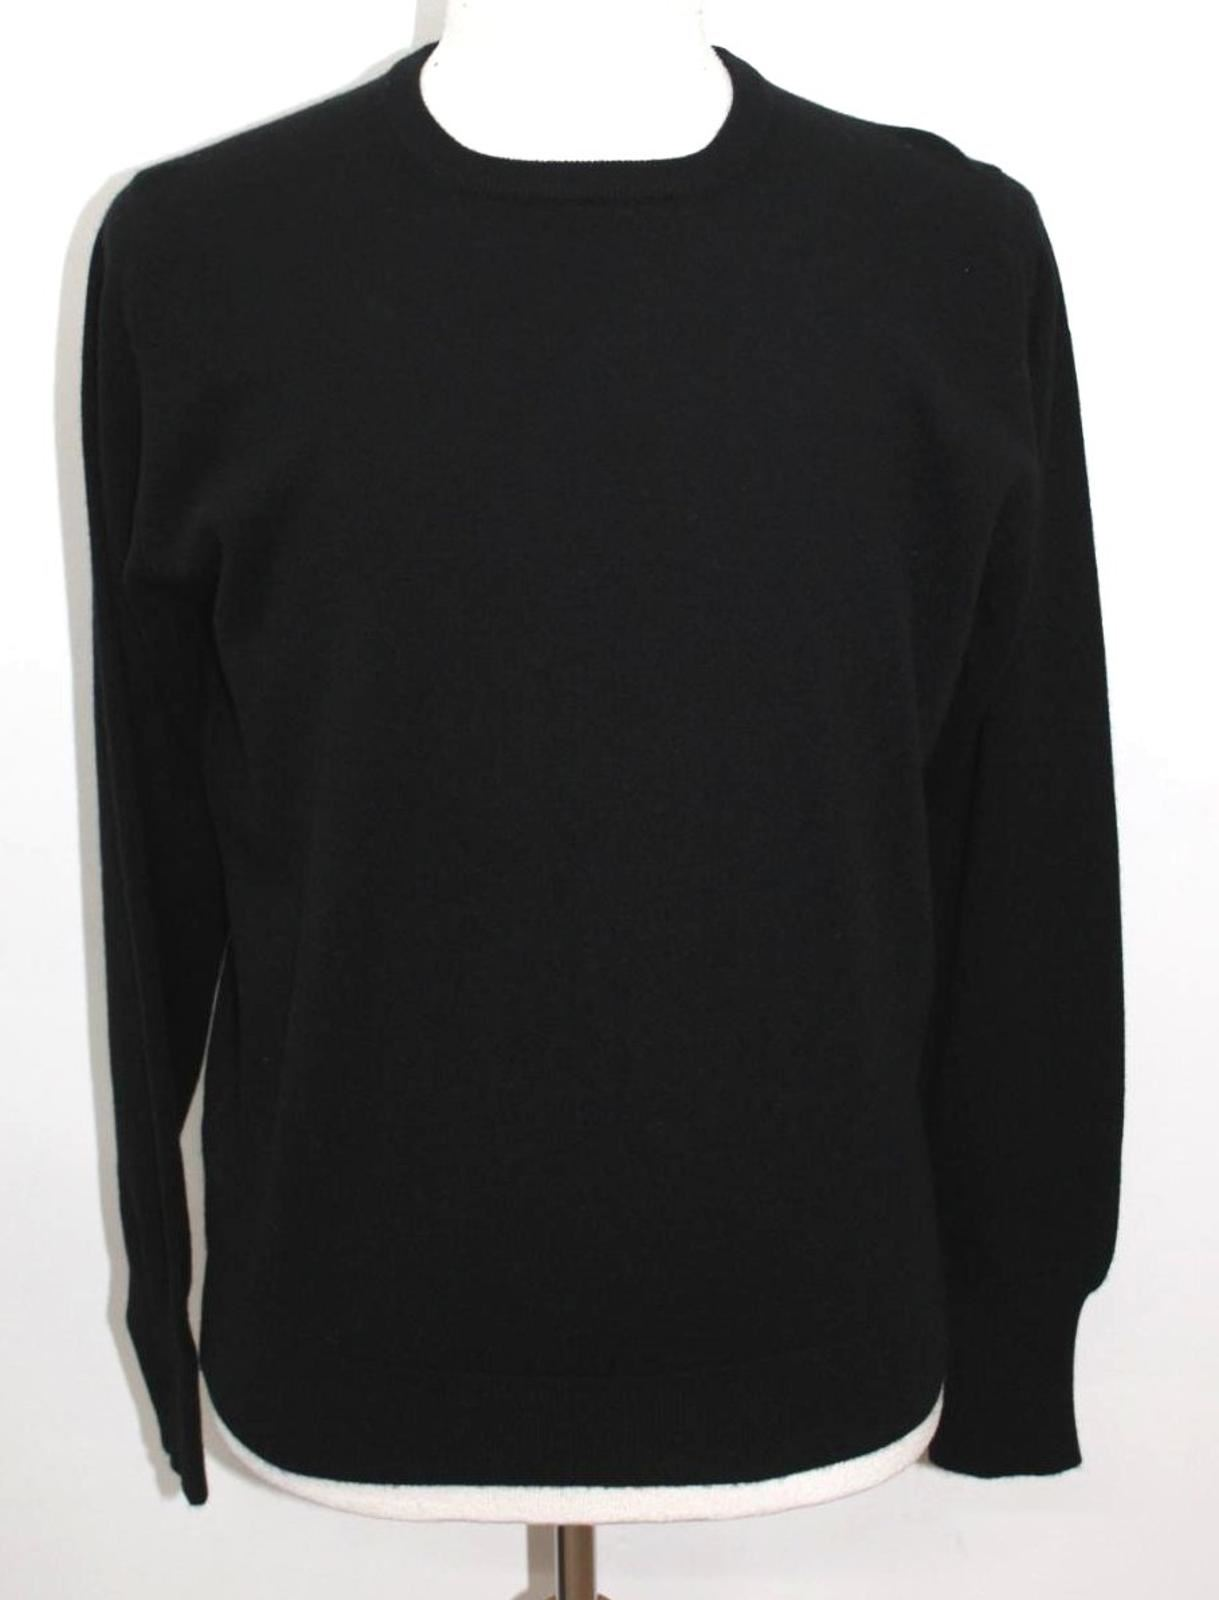 BELINDA ROBERTSON Men/'s Black Cashmere Cameron Knitwear Jumper 46//L BNWT